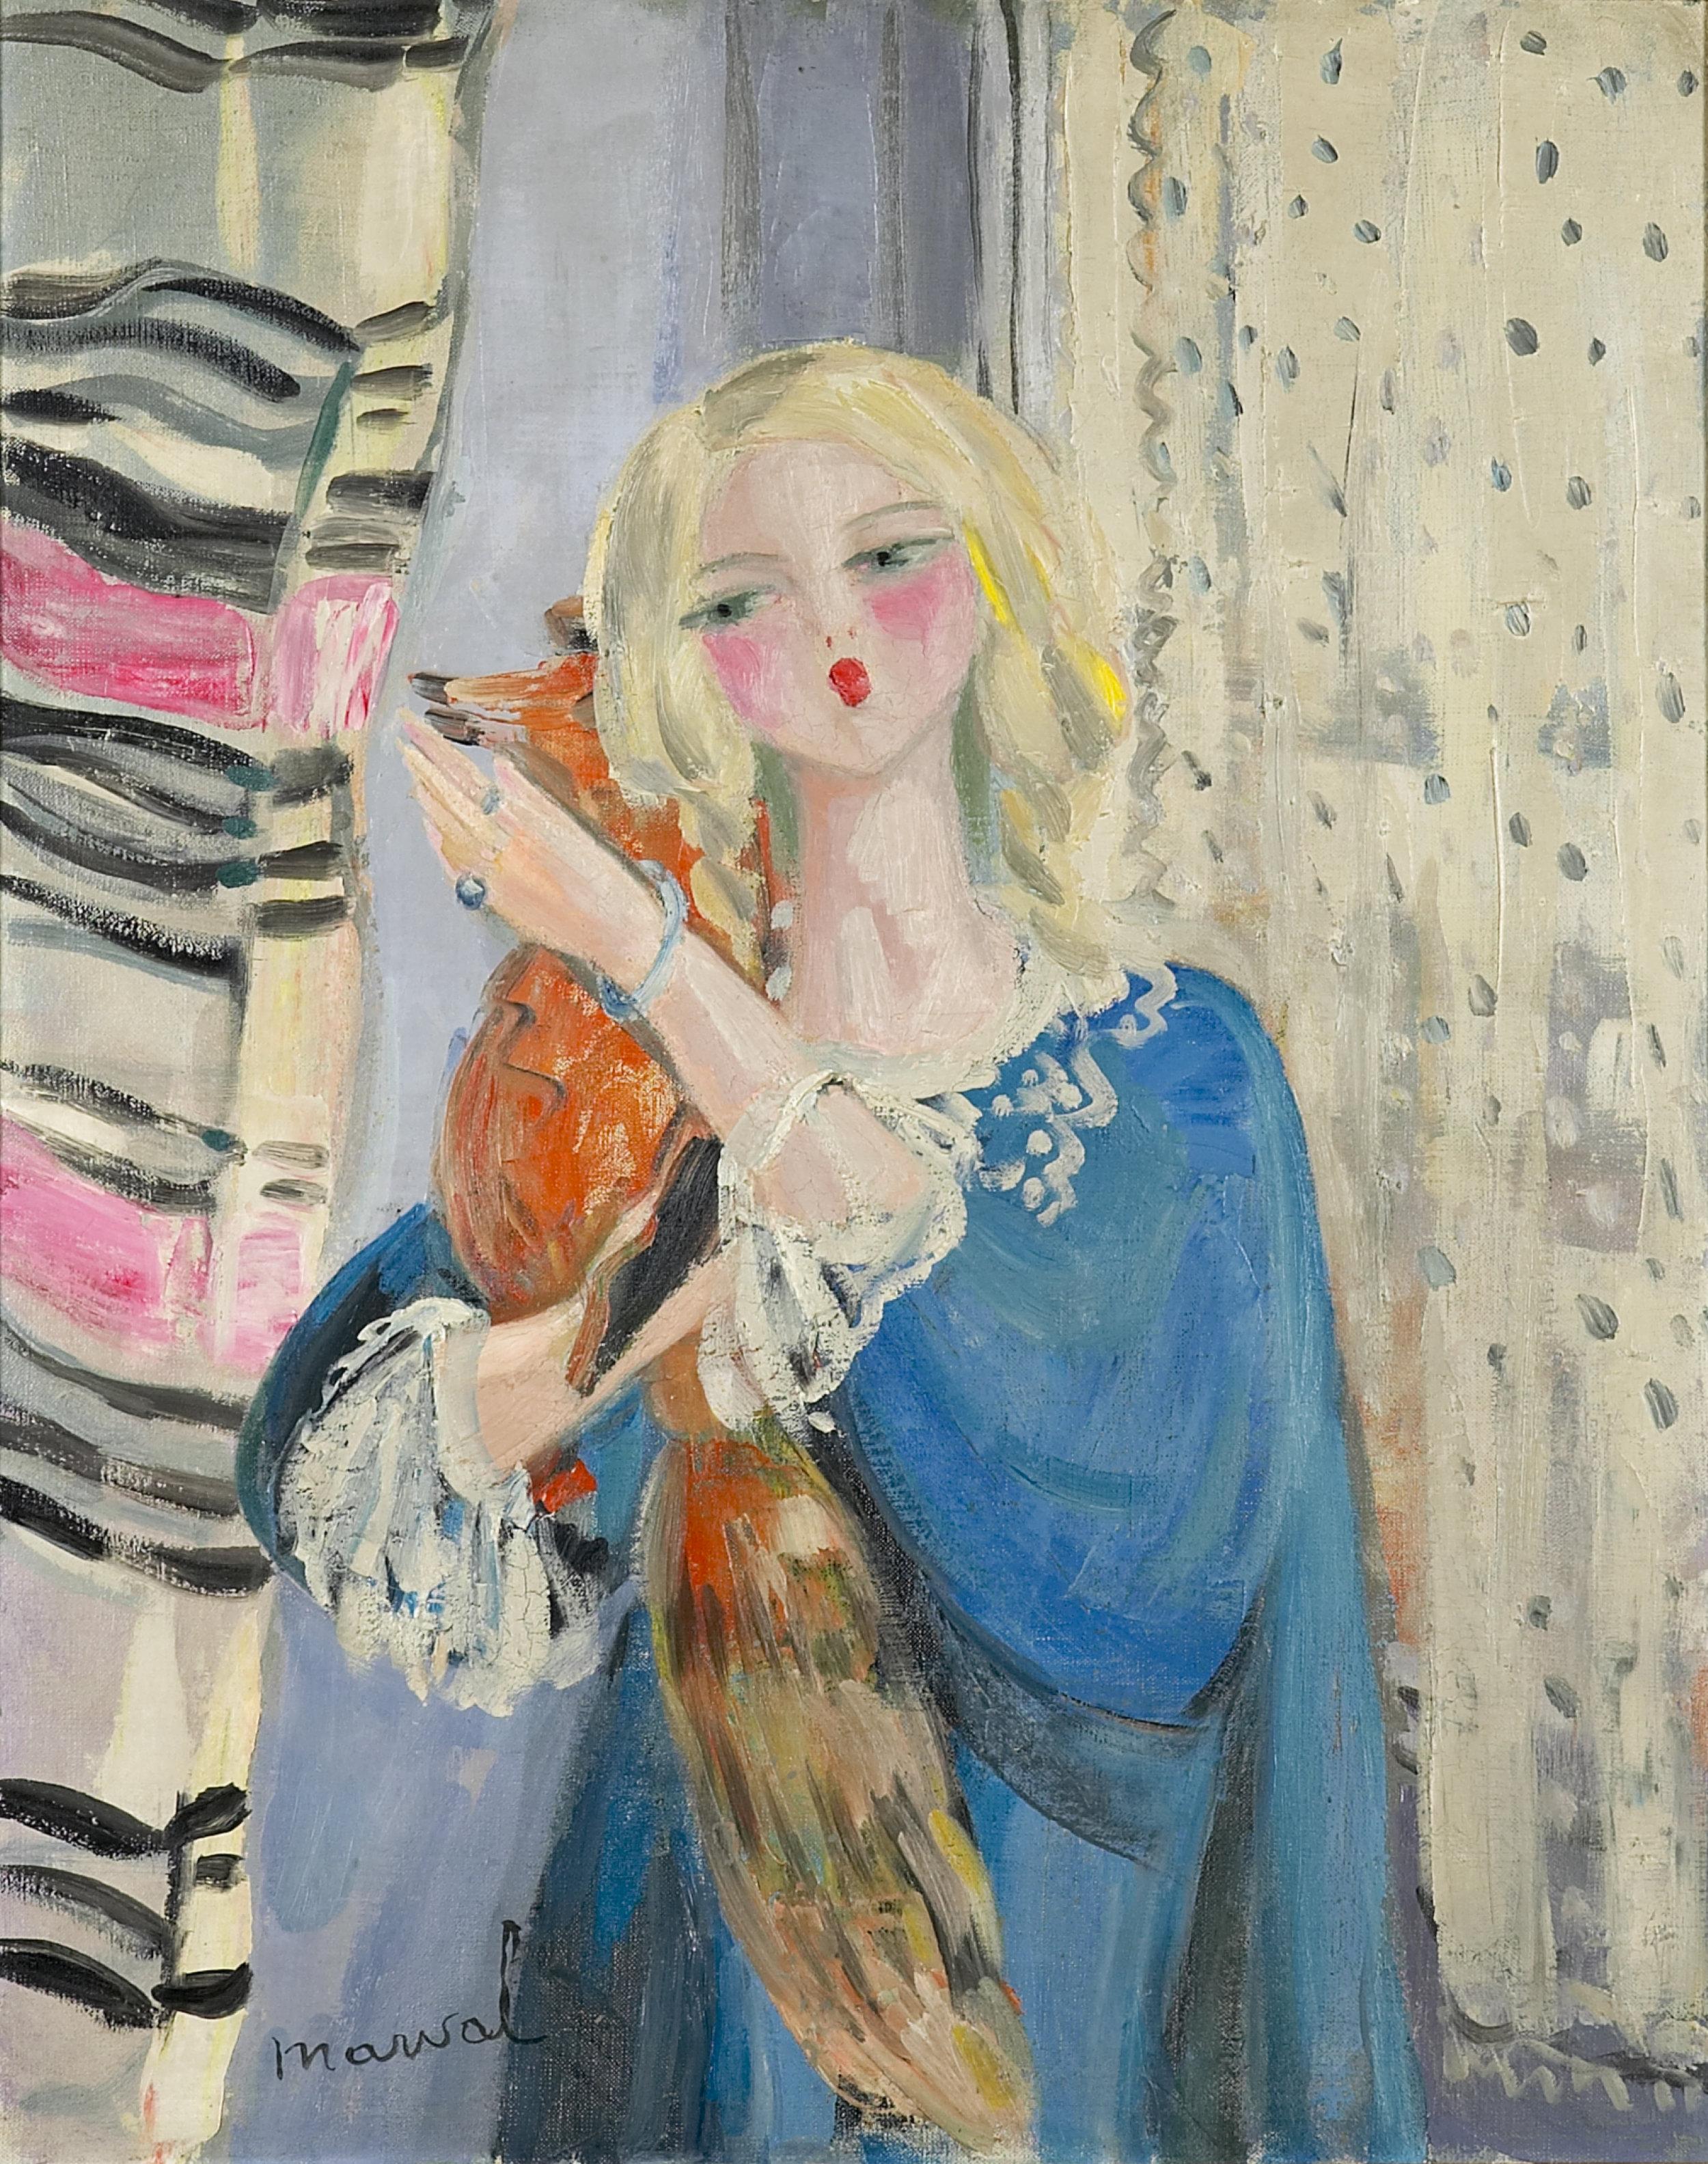 L'Enfant au Renard, Jacqueline Marval, 1922